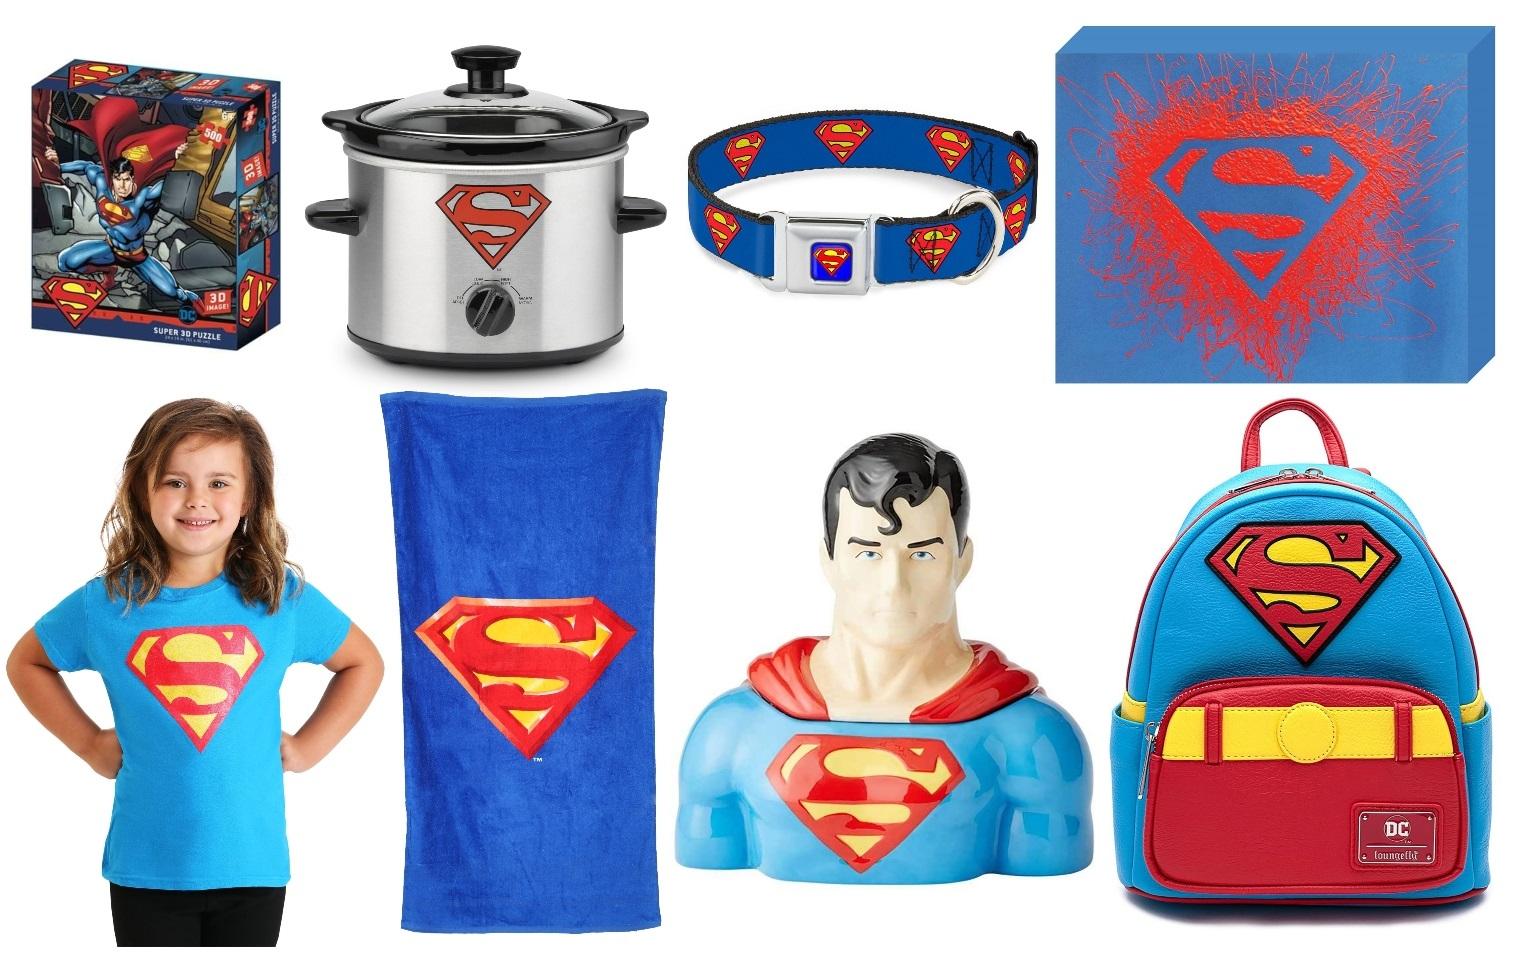 Superman Merchandise